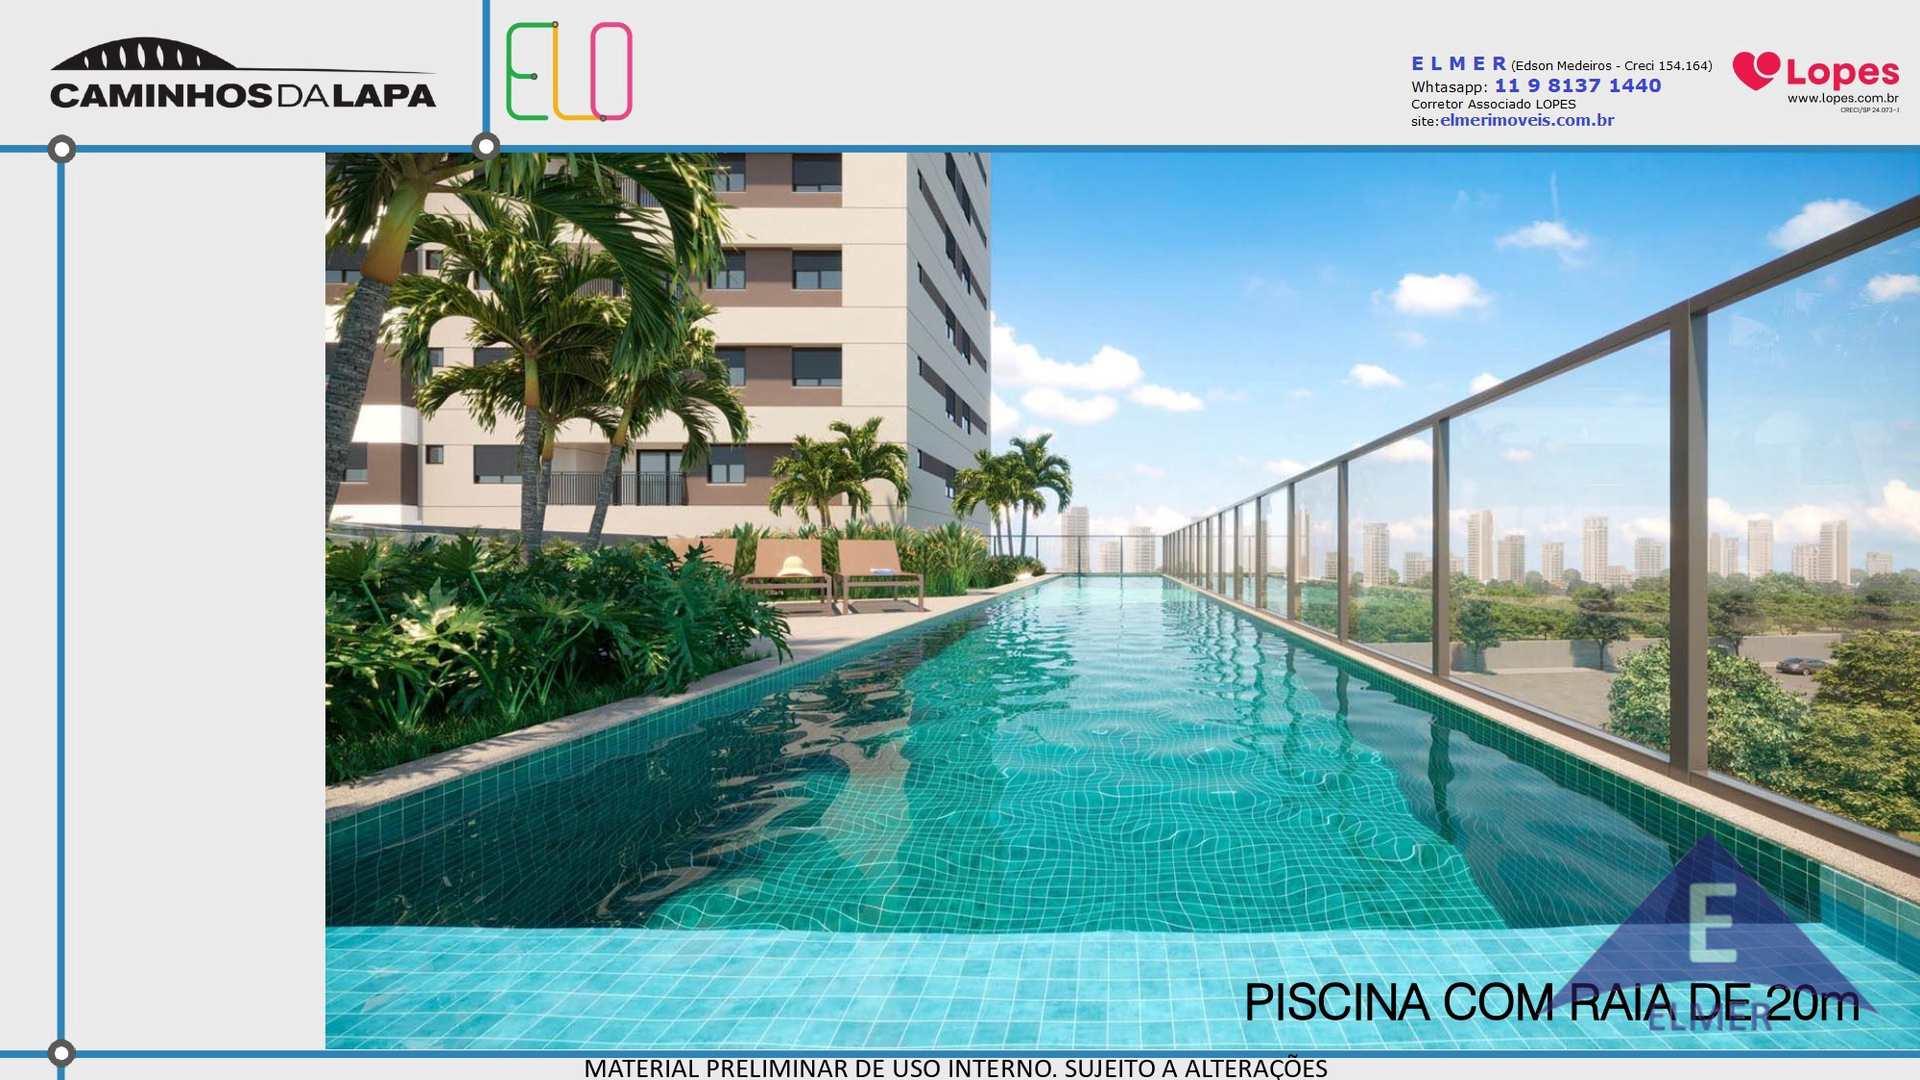 ELO - Piscina - Elmer